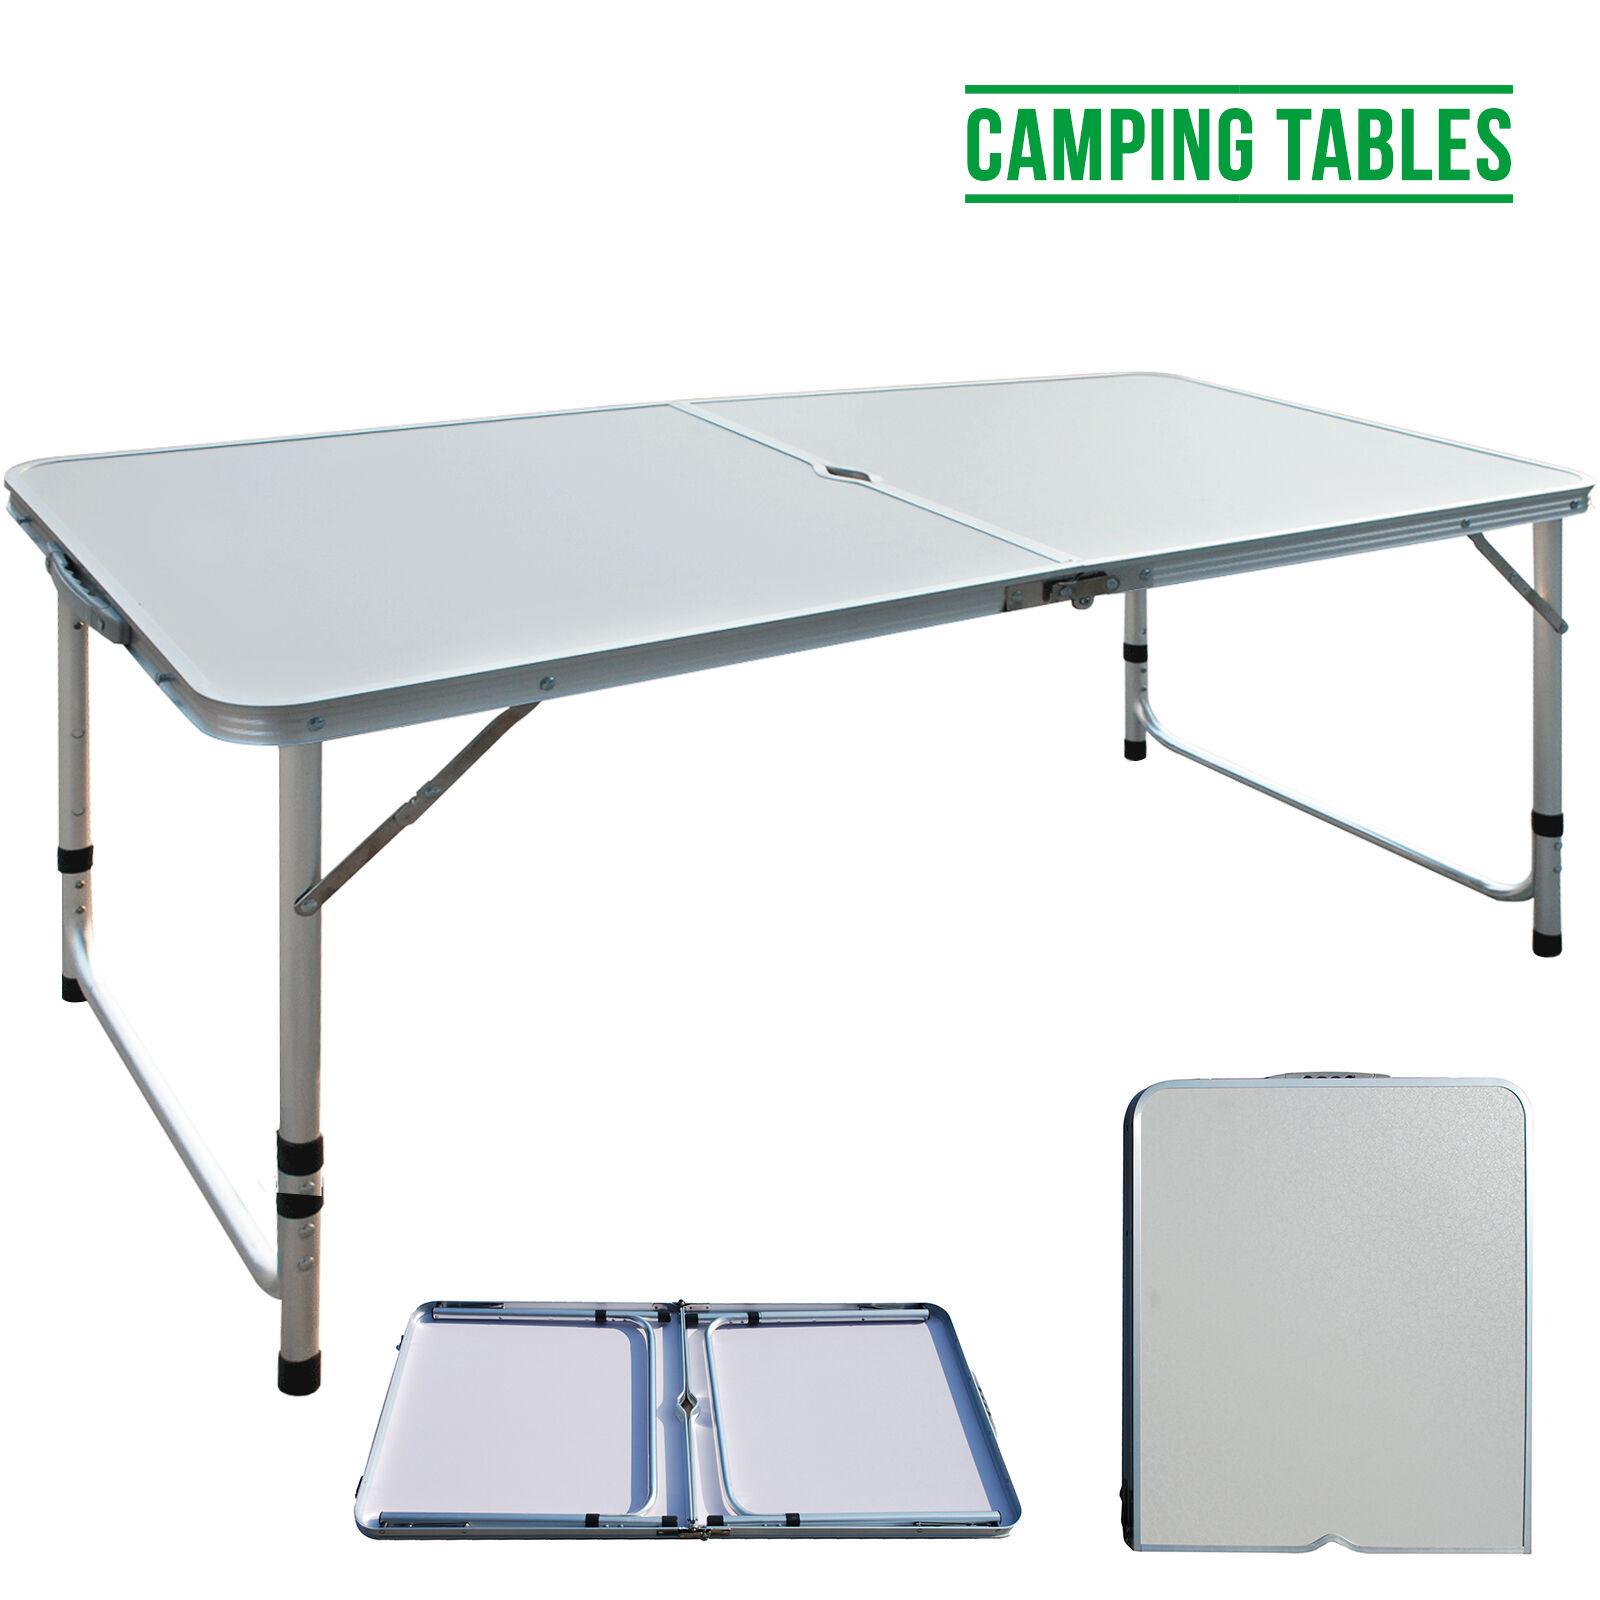 4ft Lightweight Aluminum High Adjustable Folding Camping